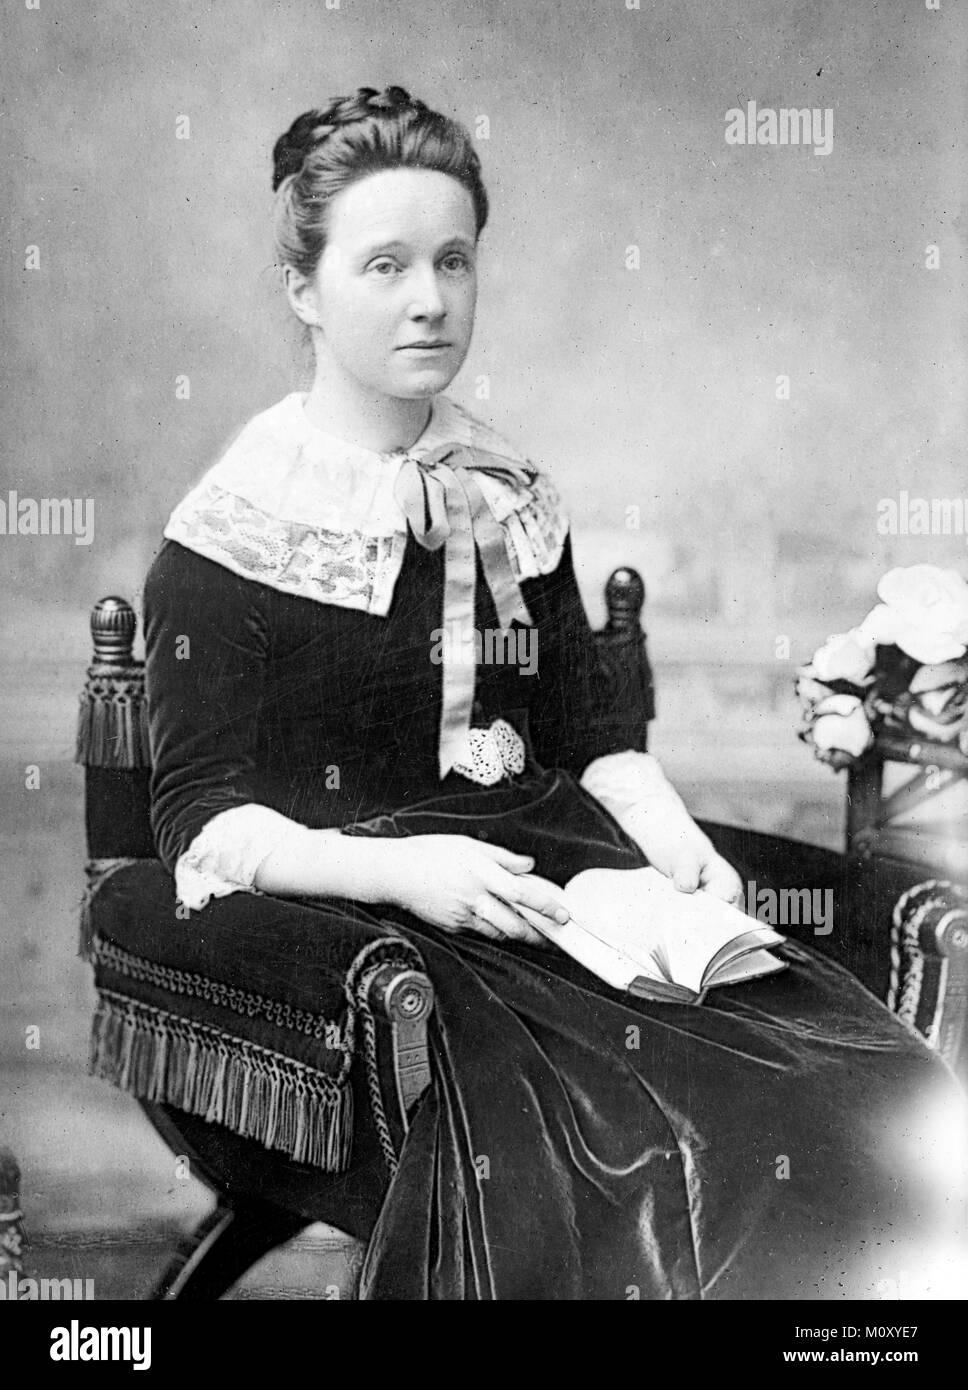 Millicent Fawcett, Mrs. Millicent Fawcett, Dame Millicent Garrett Fawcett, (1847 – 1929) British feminist and writer. - Stock Image